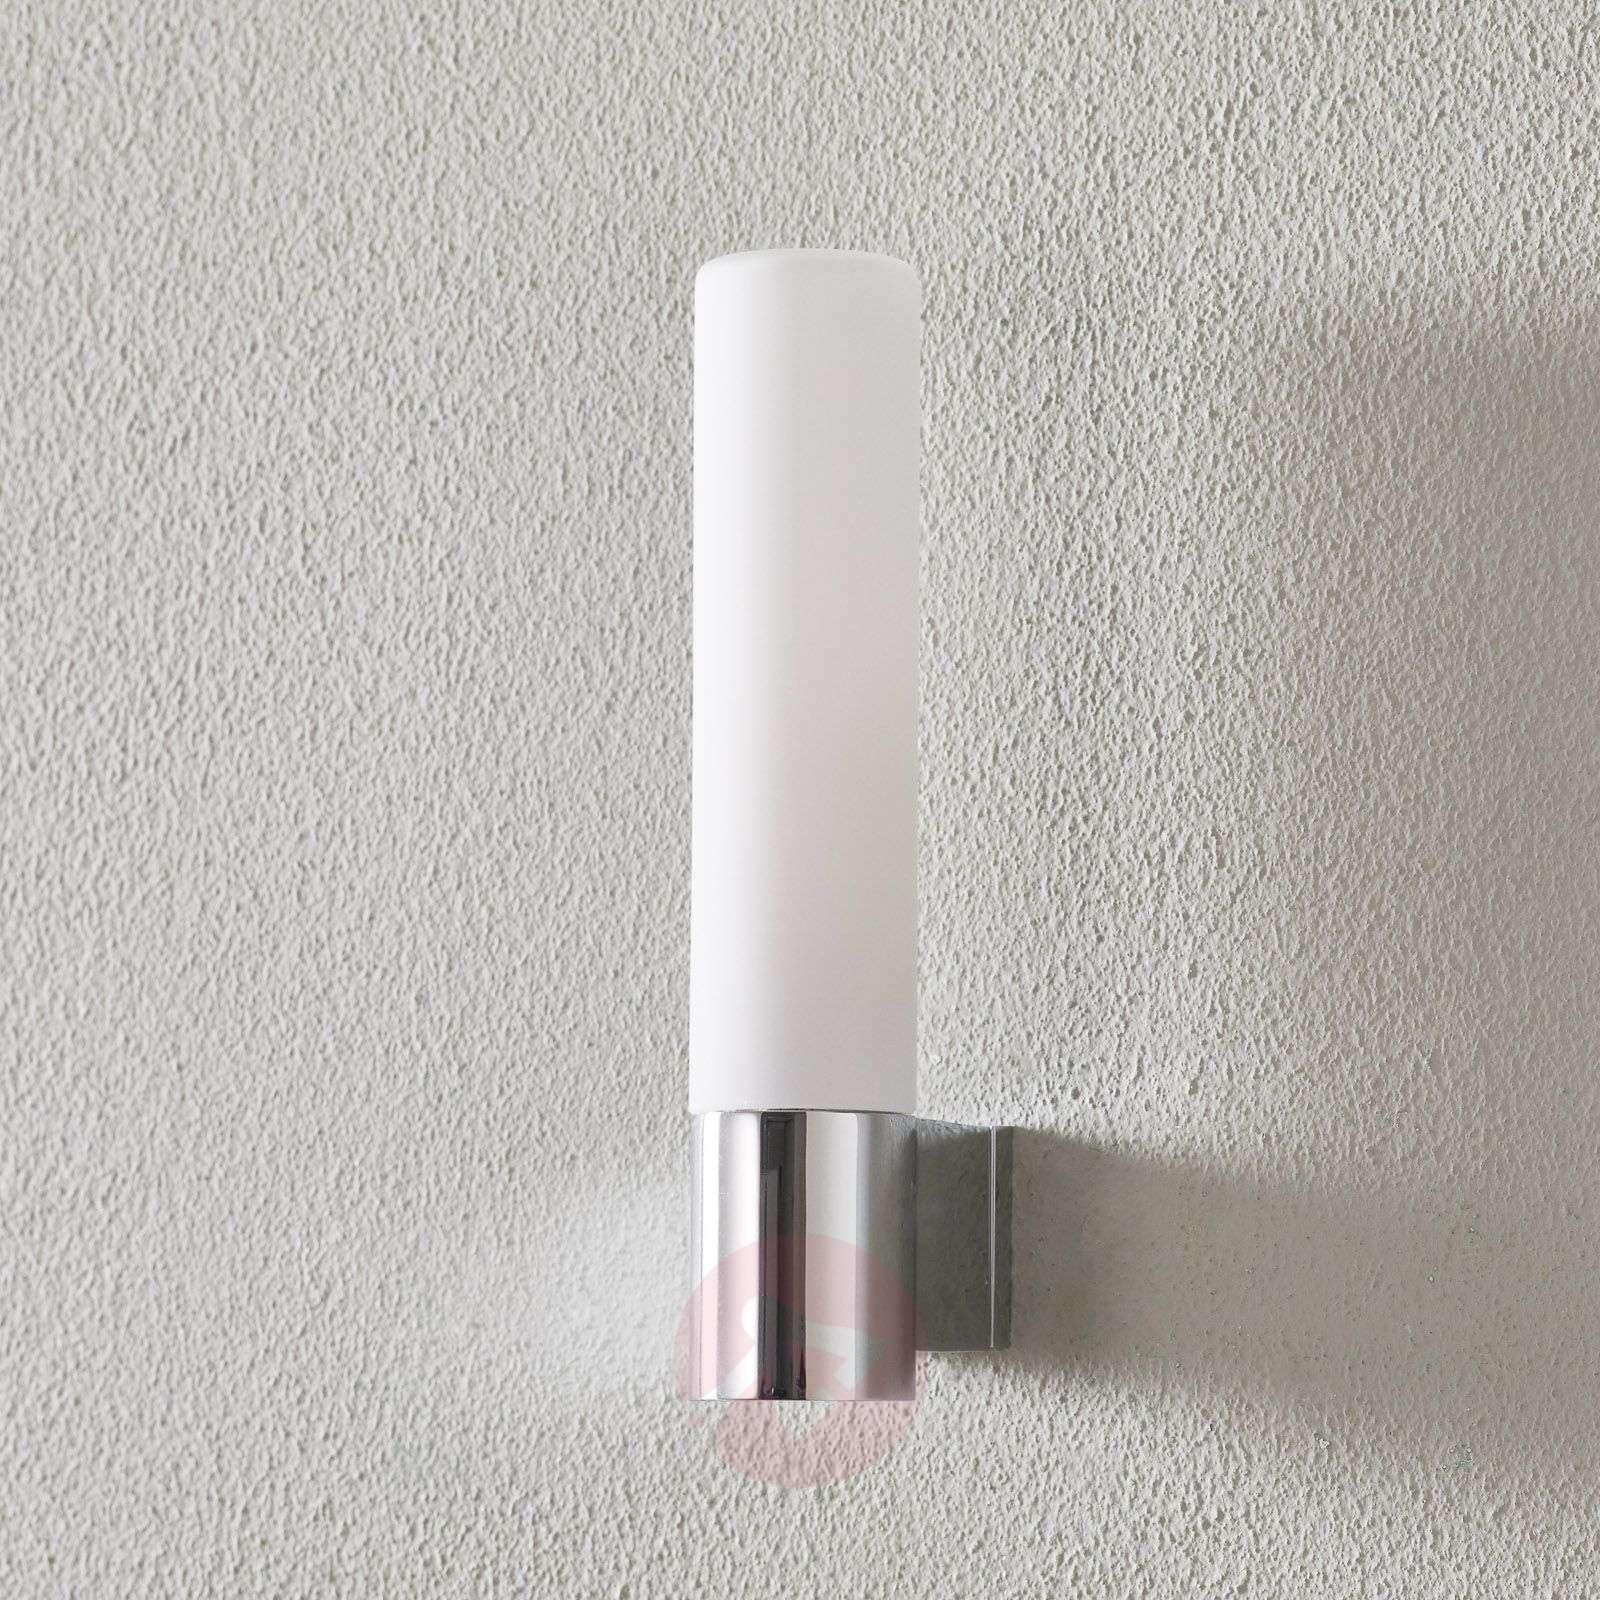 Bari Bathroom Wall Light with White Glass-1020012-03